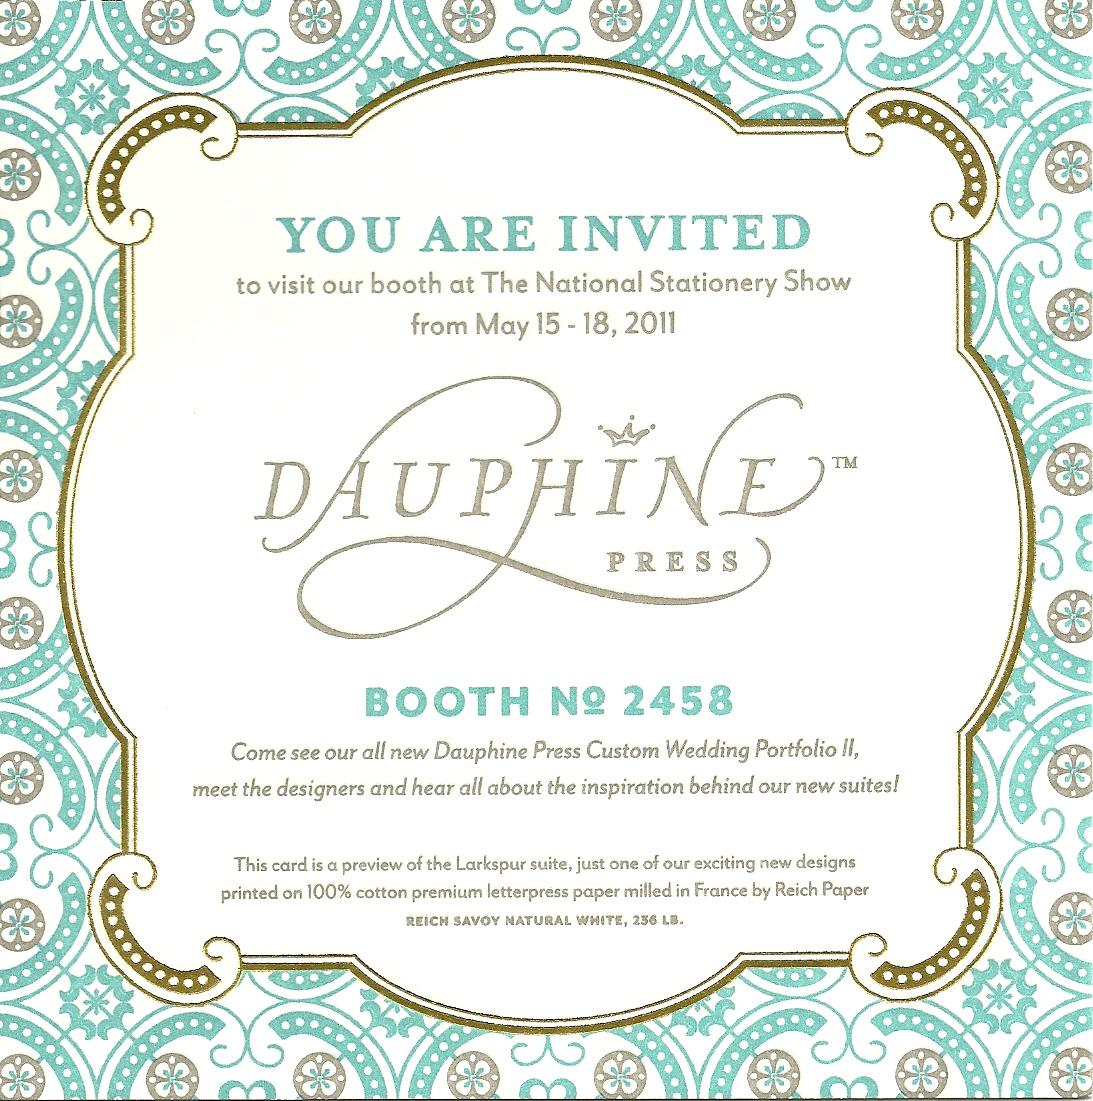 Avery Invitation Templates is luxury invitations example